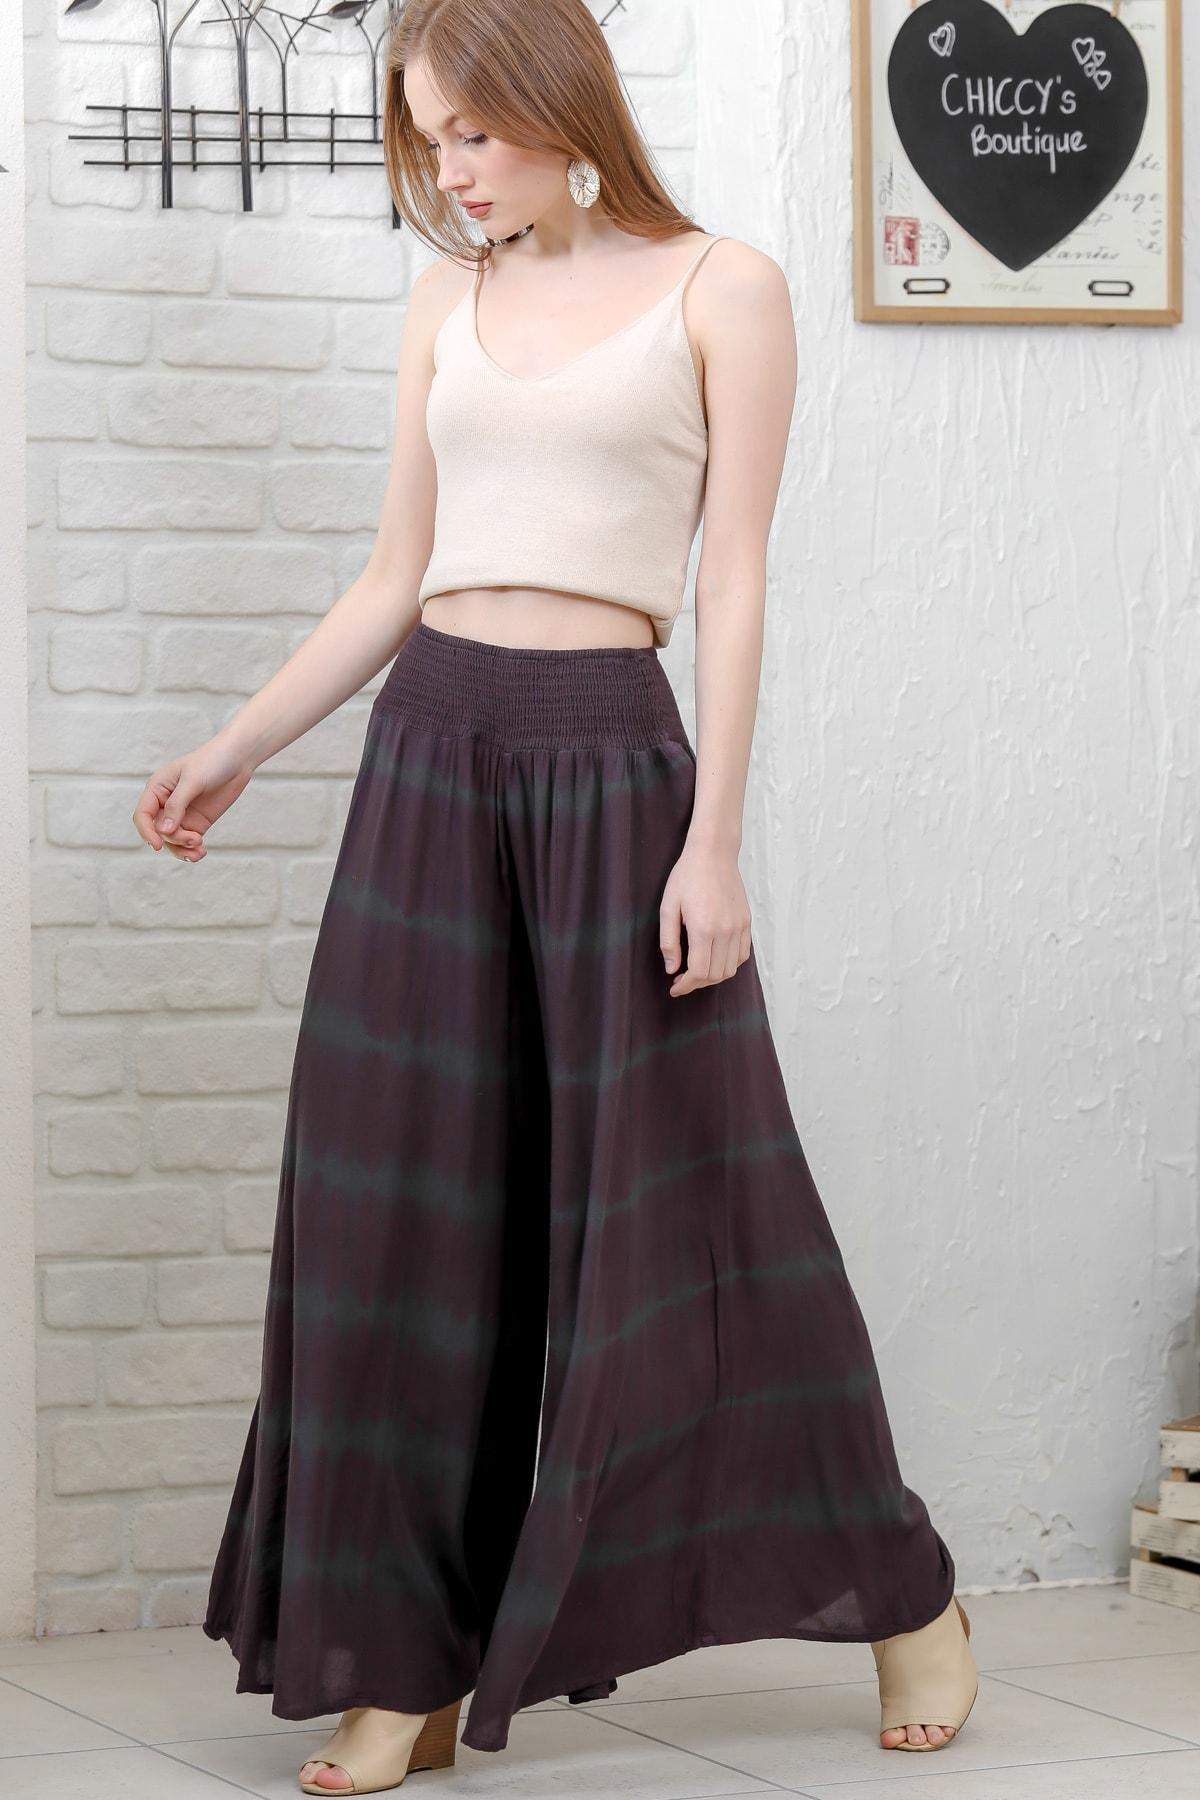 Chiccy Kadın Mürdüm Batik Desenli Beli Lastikli Bol Paçalı Dokuma Pantolon M10060000PN98864